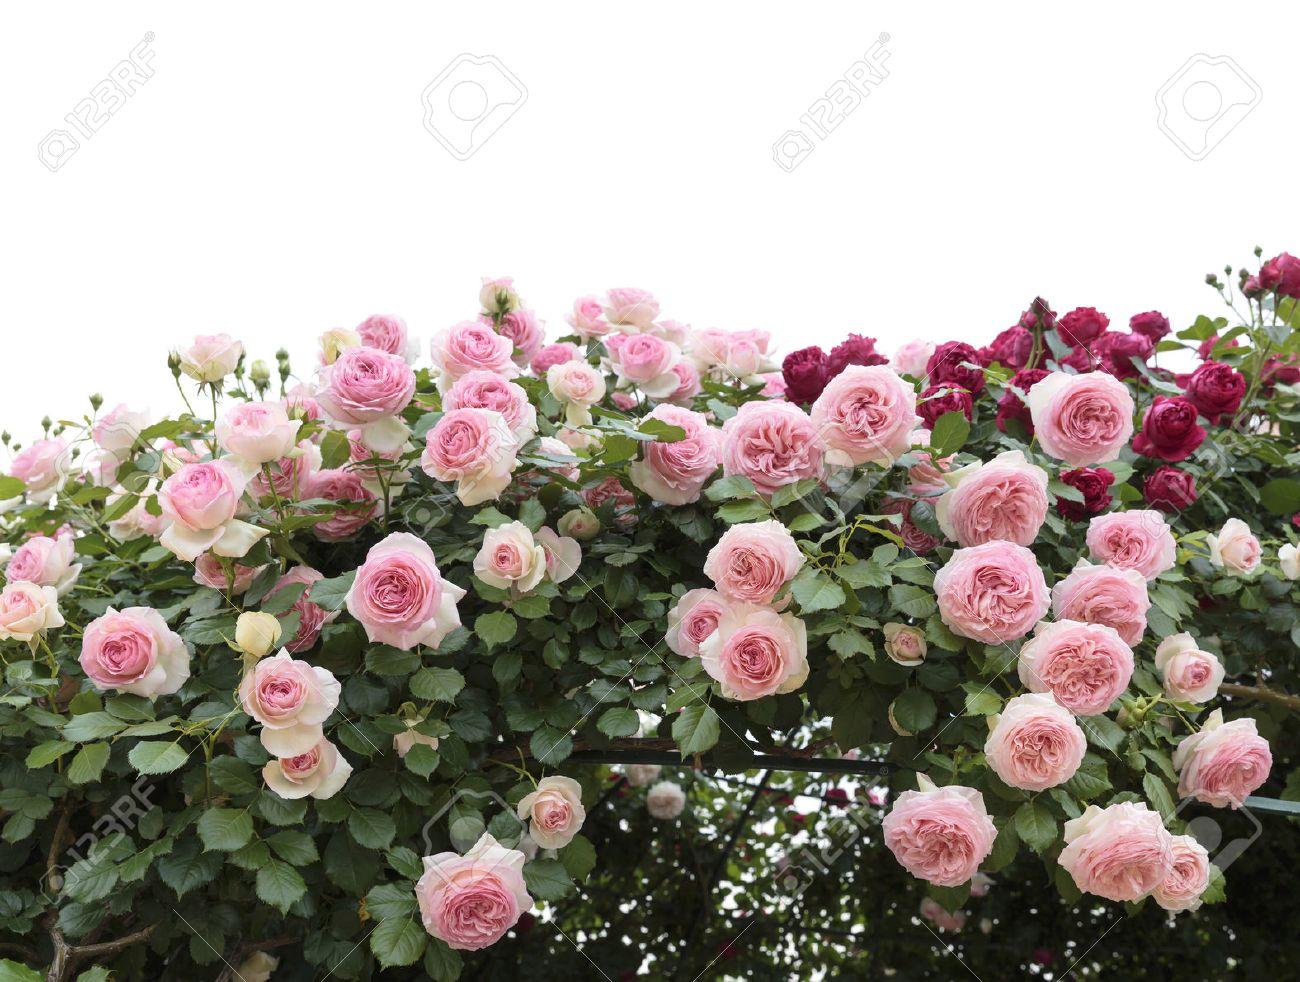 Climbing pink roses in garden - 40401955